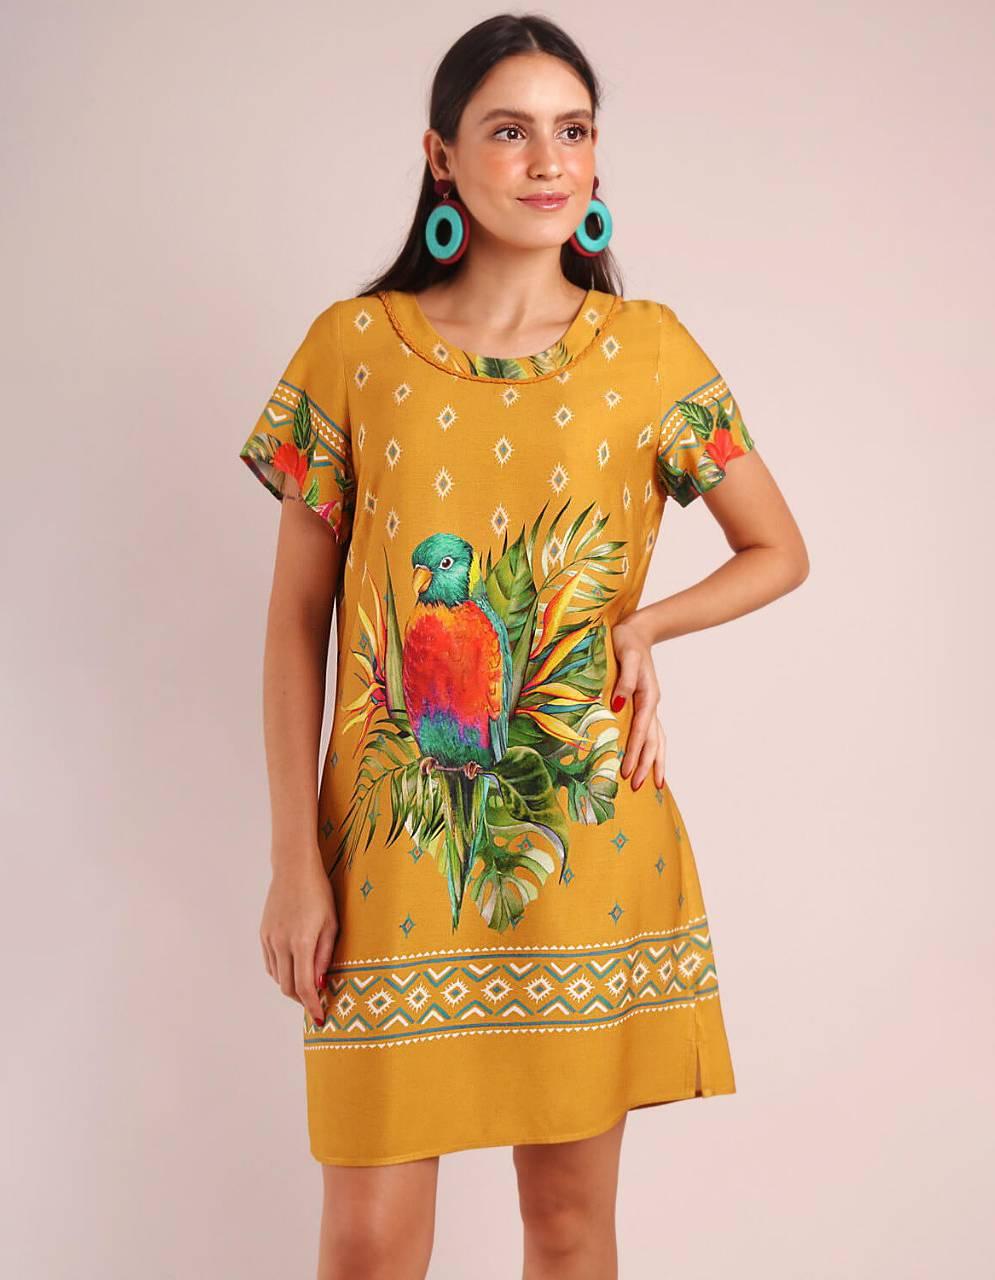 Vestido verano corto amarillo estampado manga corta y escote redondo Malagueta-72093MAL